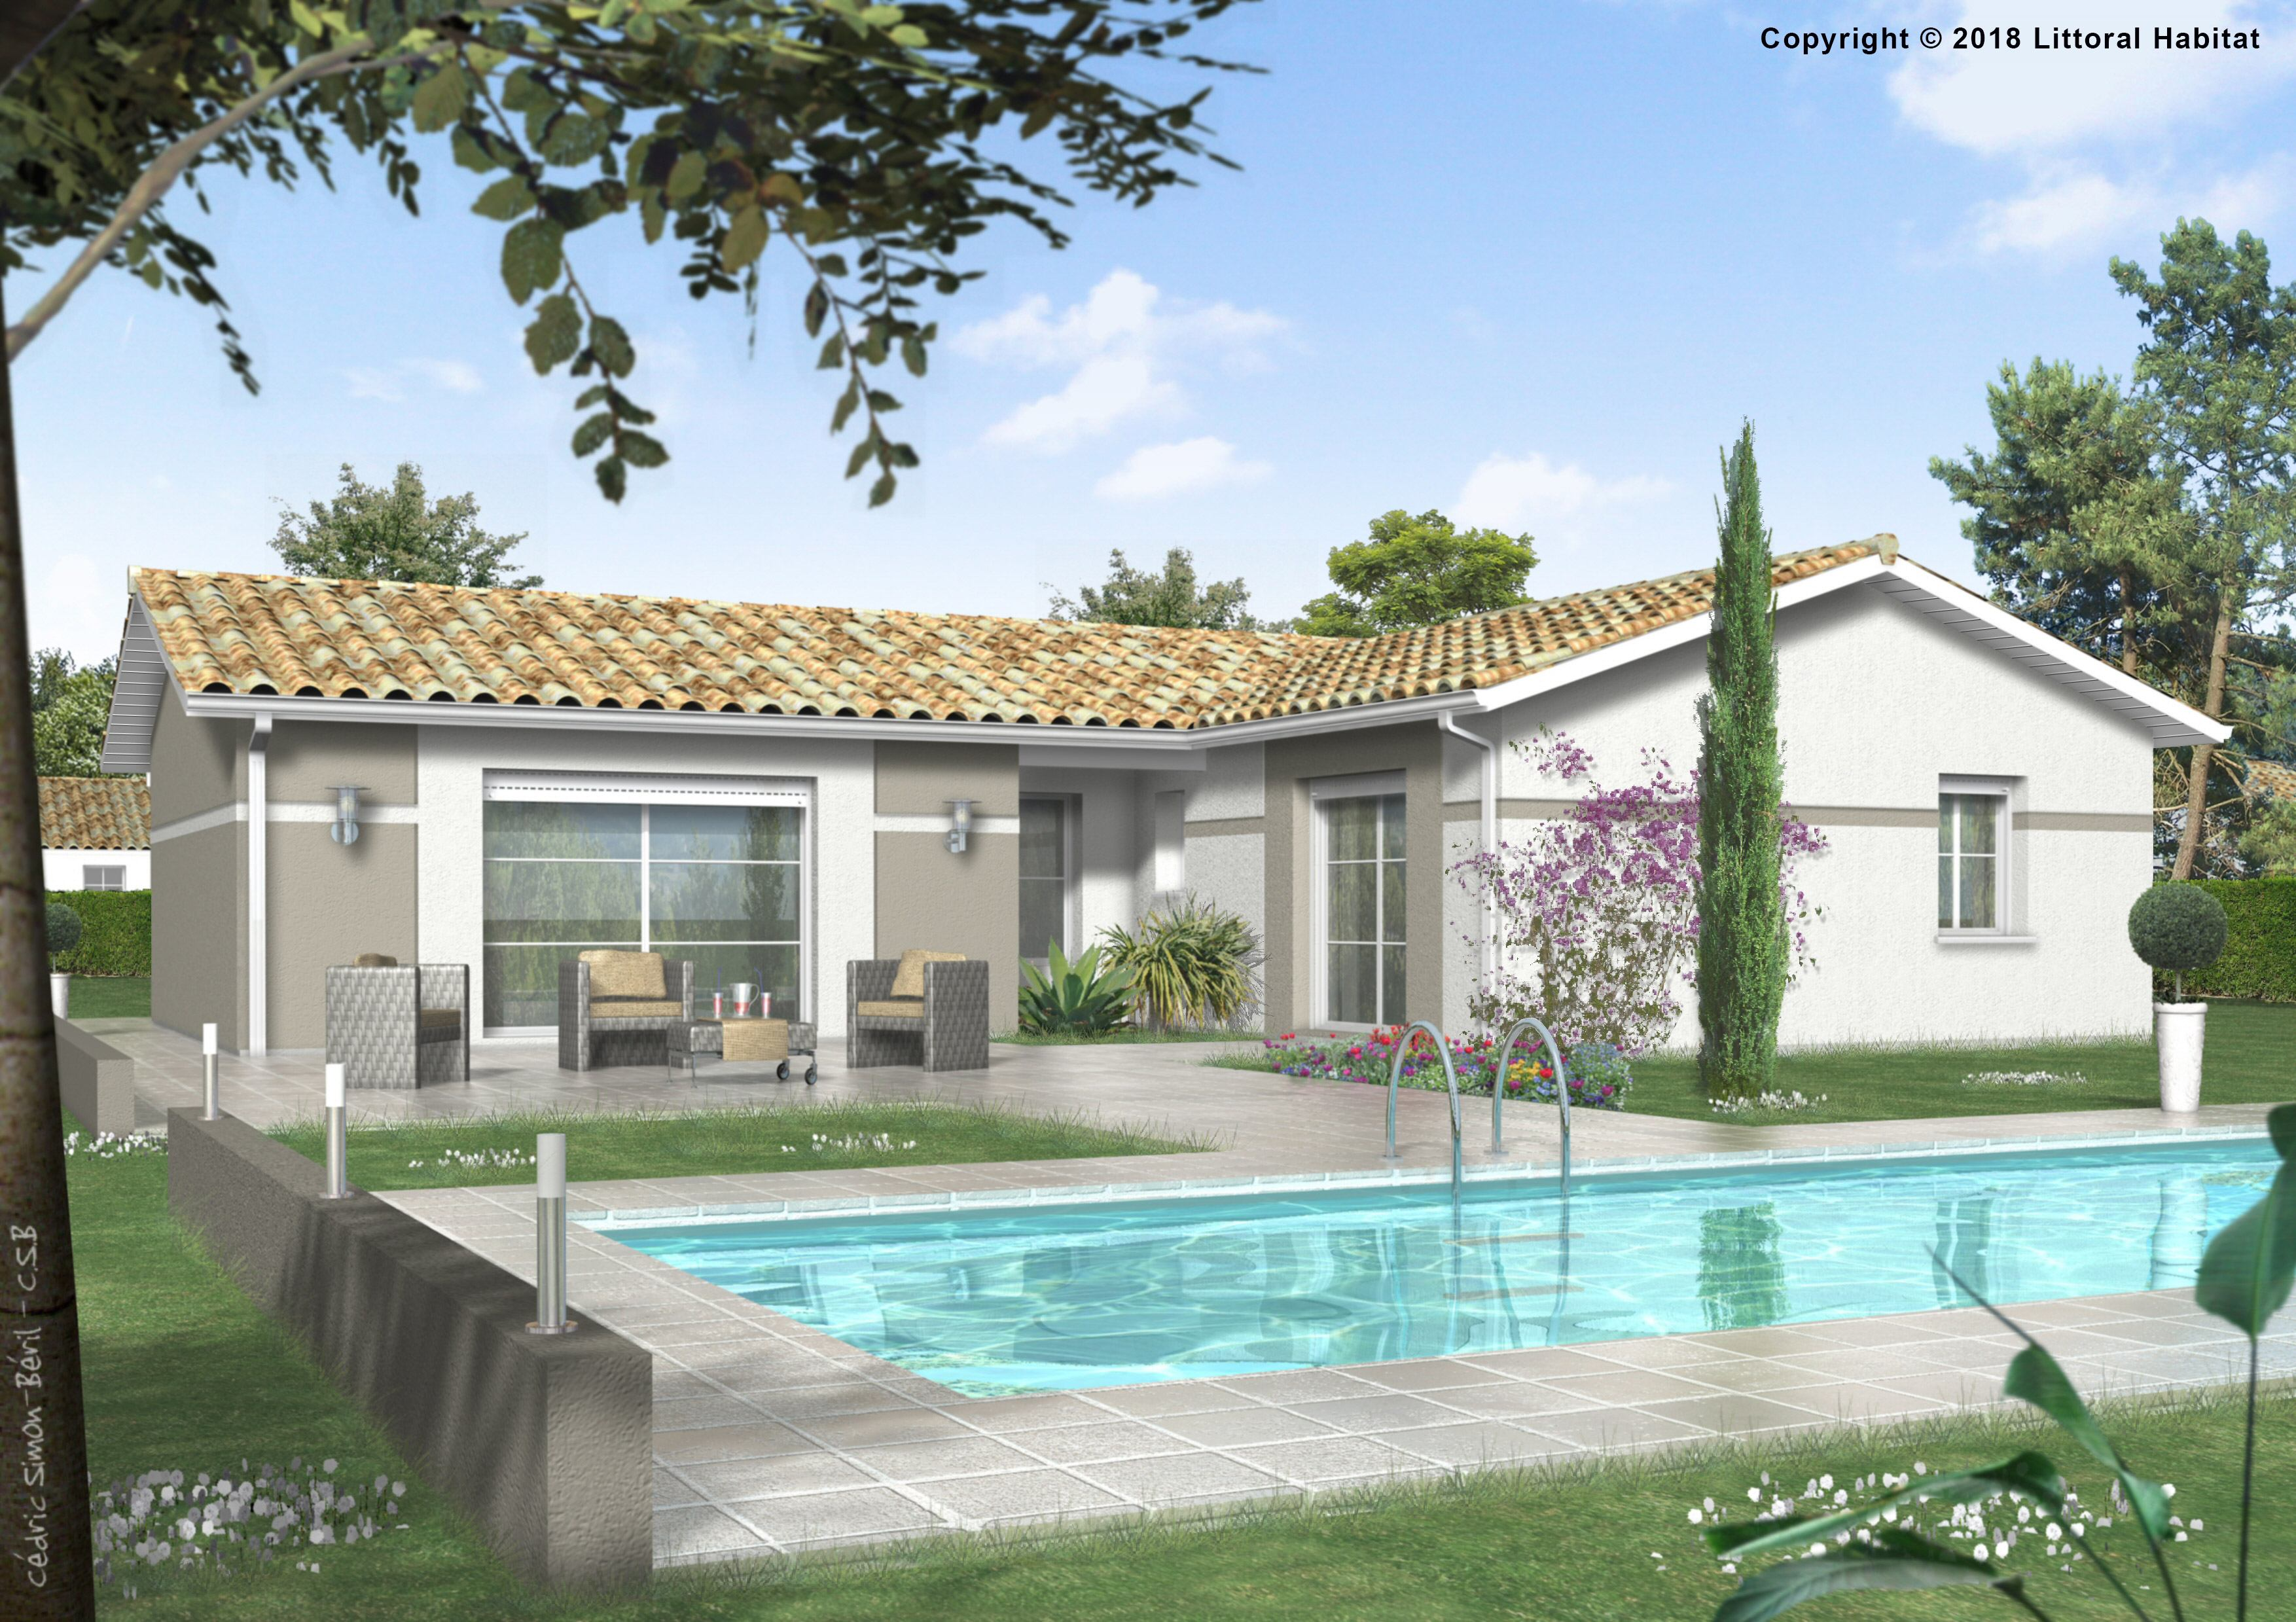 Maisons + Terrains du constructeur LITTORAL HABITAT DAX • 86 m² • TALLER